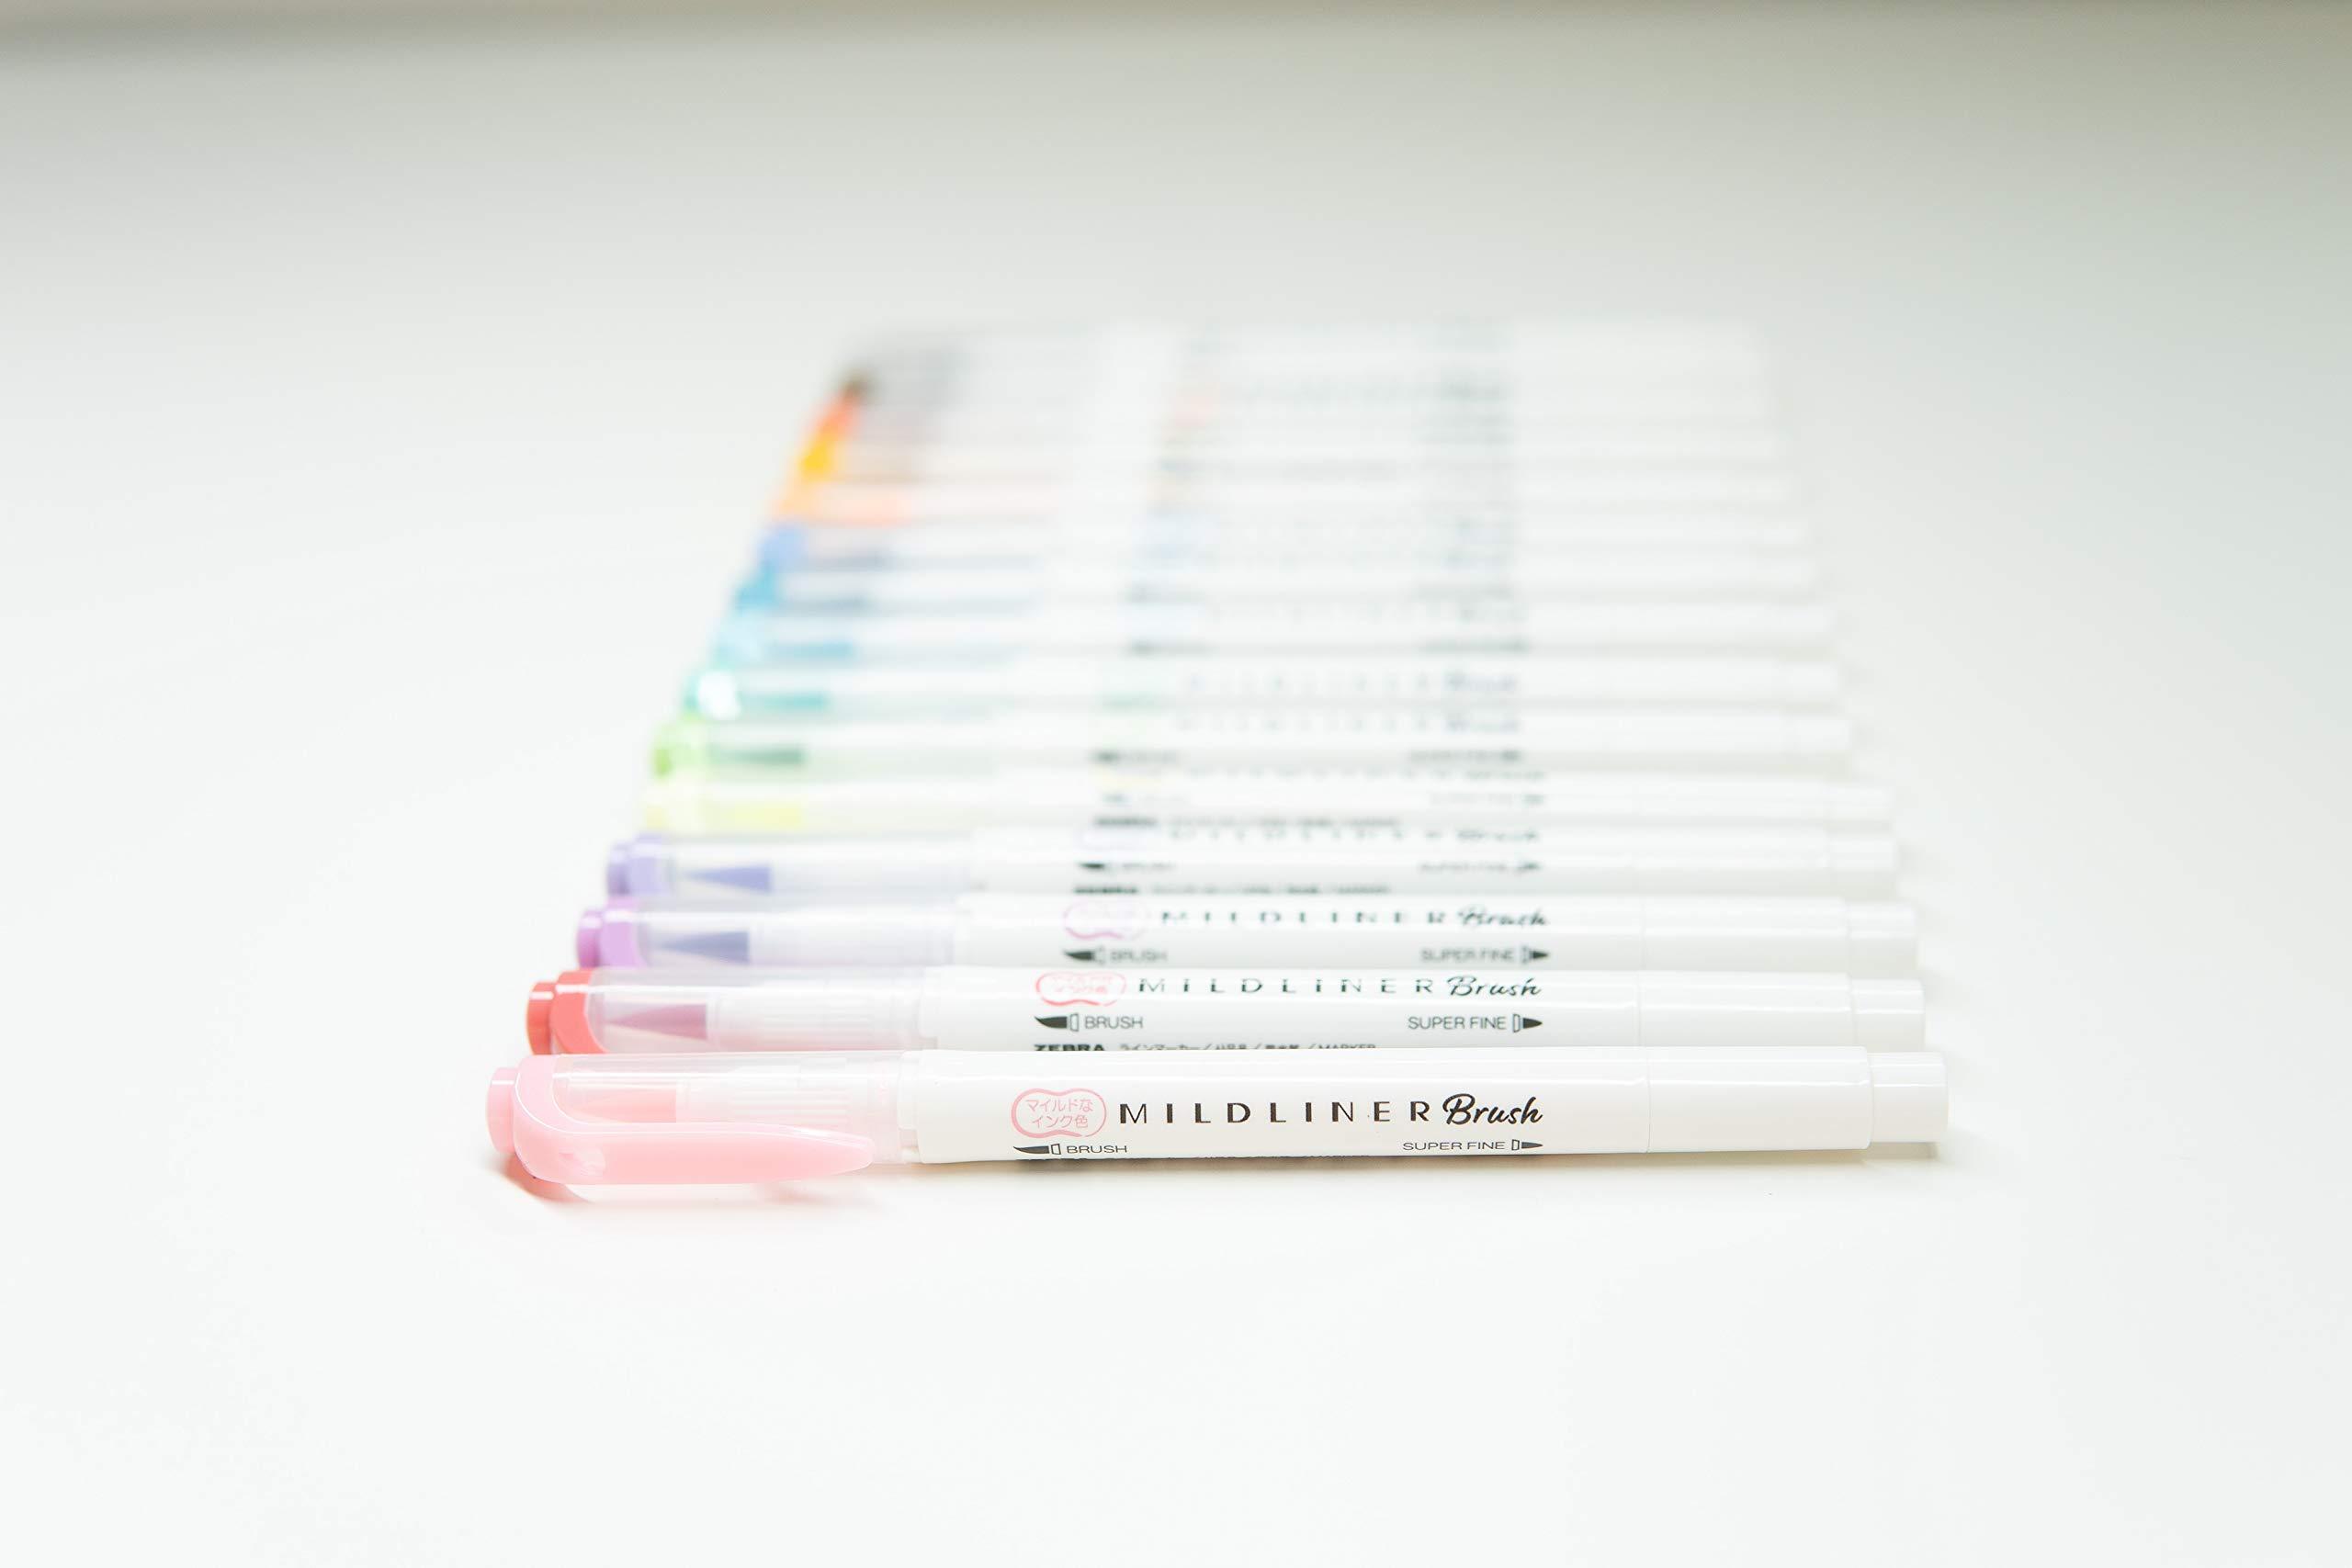 Zebra Pen Mildliner Double Ended Brush and Fine Tip Pen, Assorted Colors, 15-Count by Zebra Pen (Image #5)